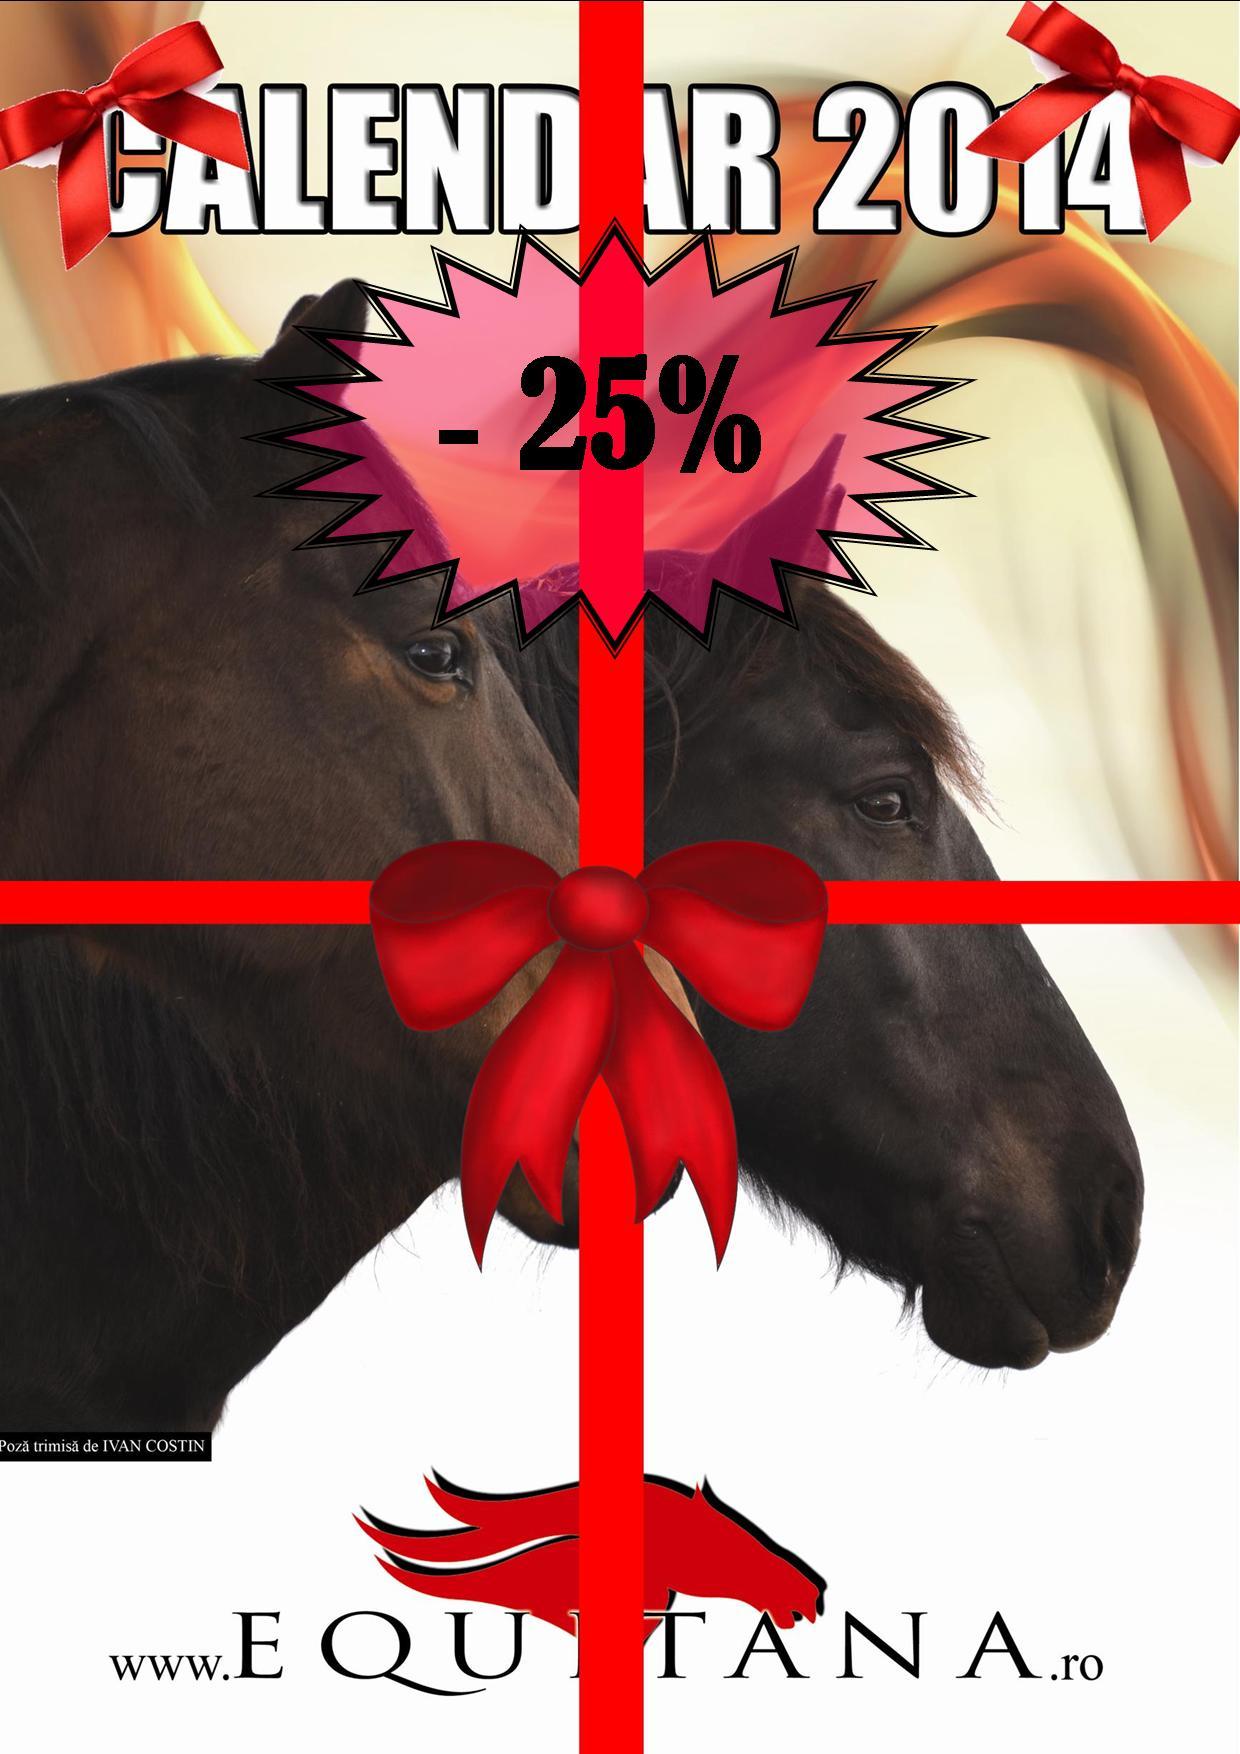 25 % DISCOUNT LA CALENDARUL EQUITANA 2014